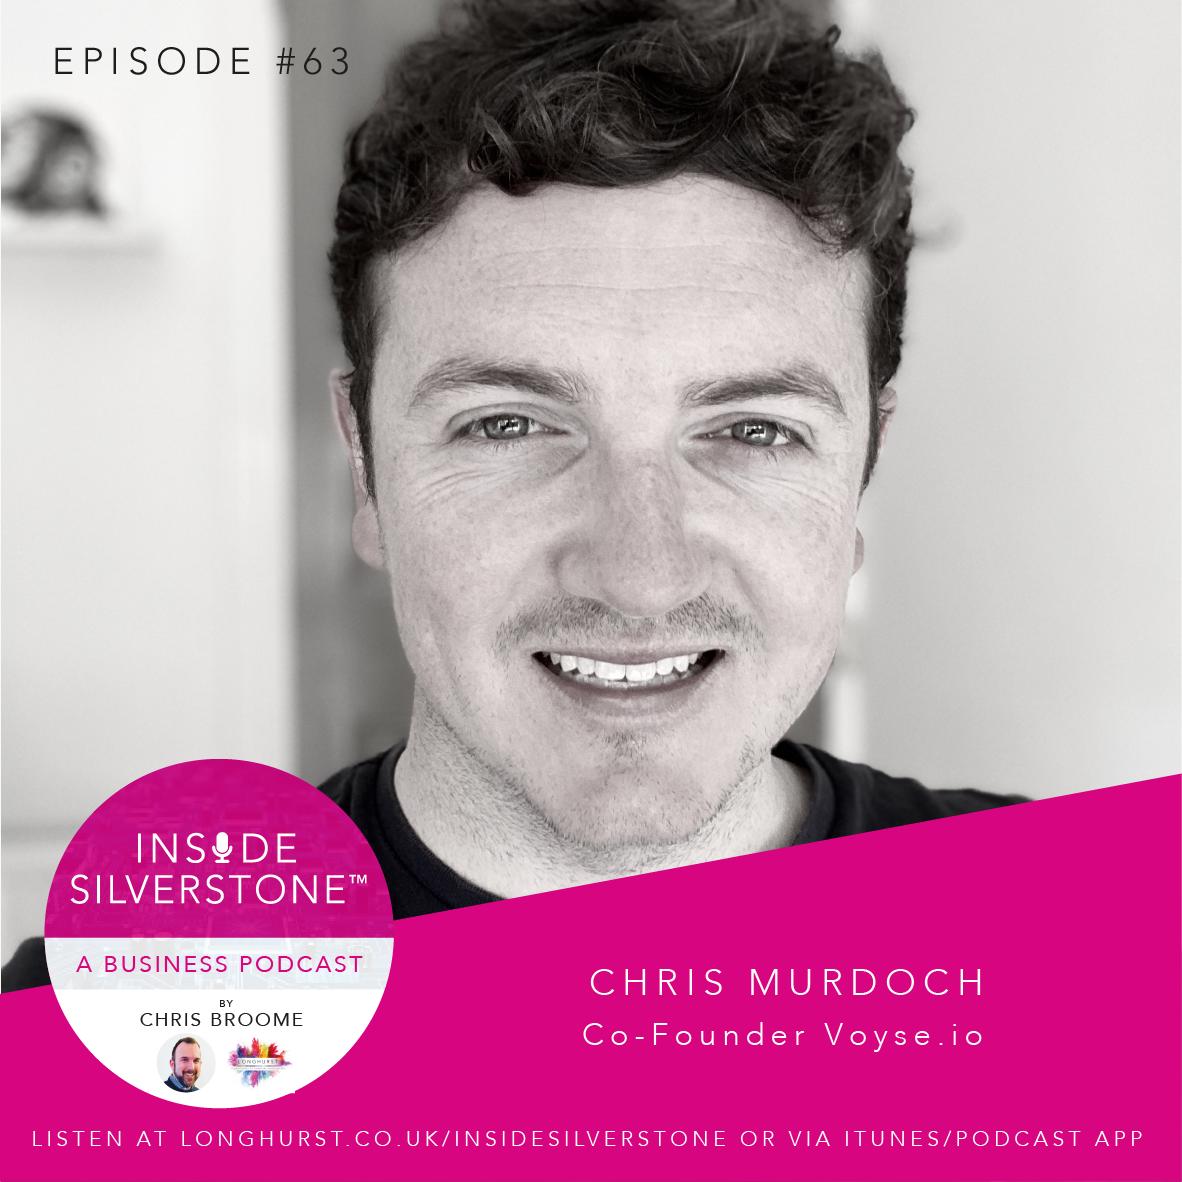 Chris Murdoch, tech entrepreneur and co-founder of Voyse.io